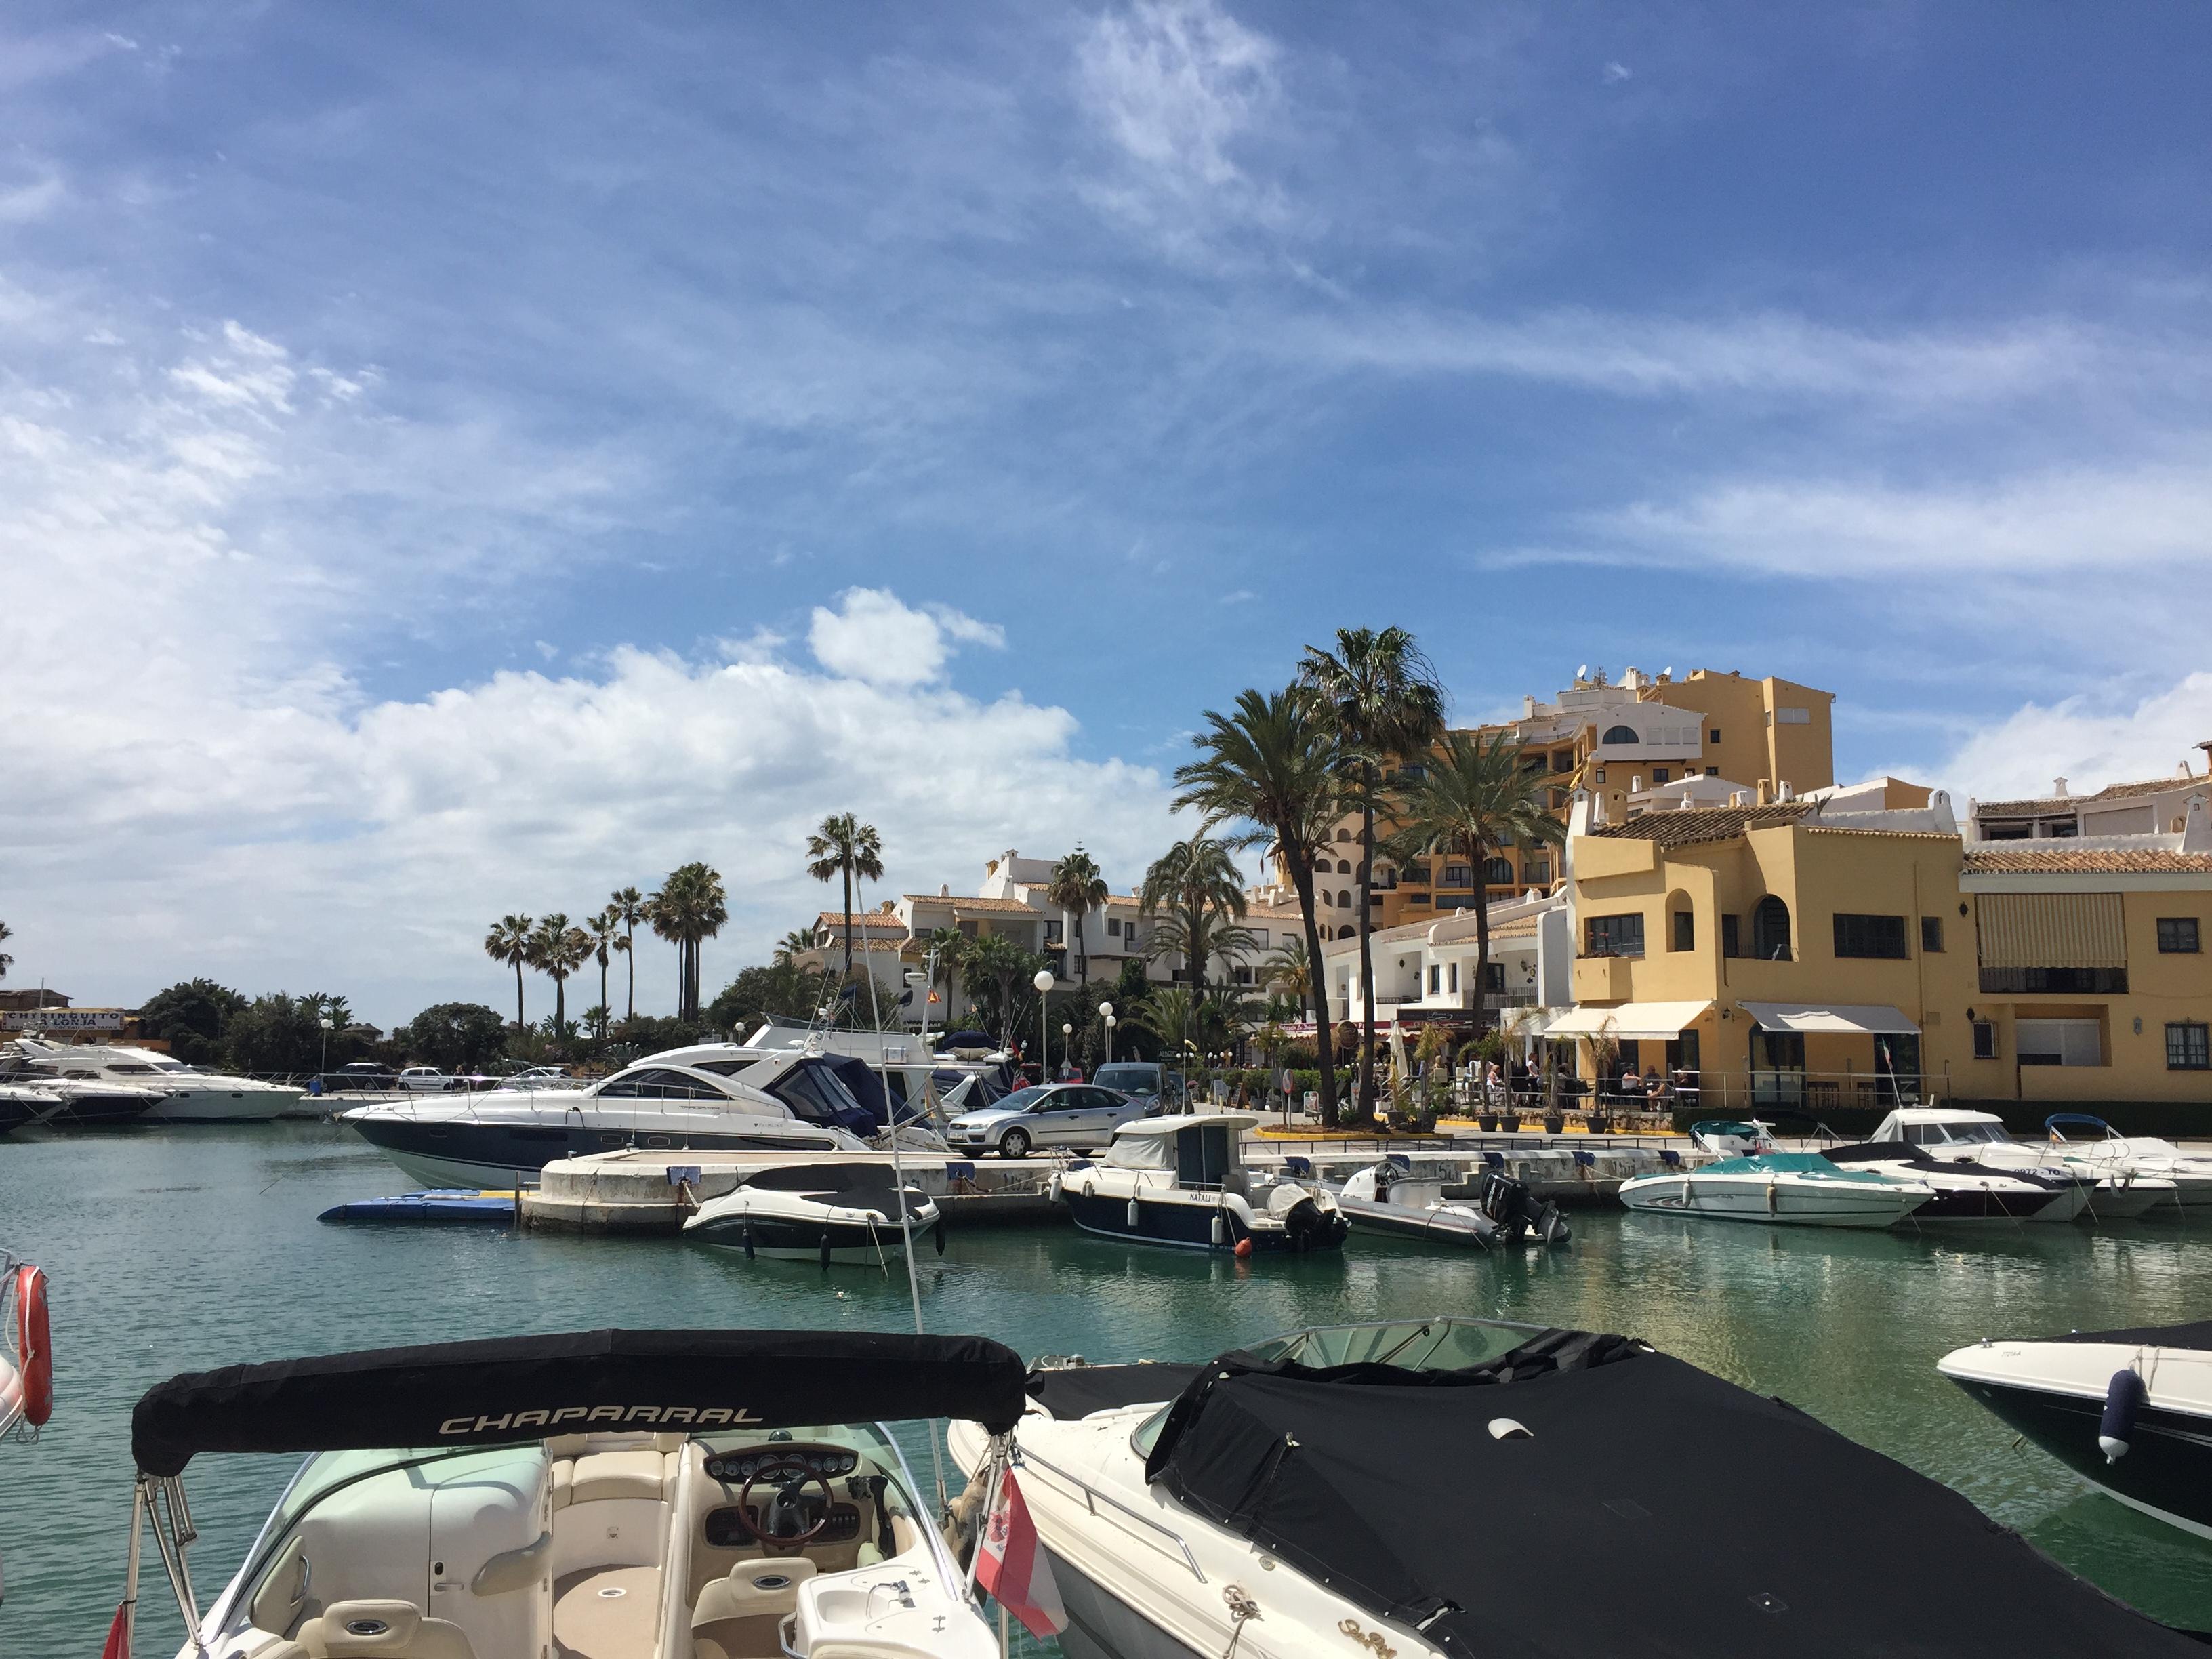 Порт и пляж Кабопино